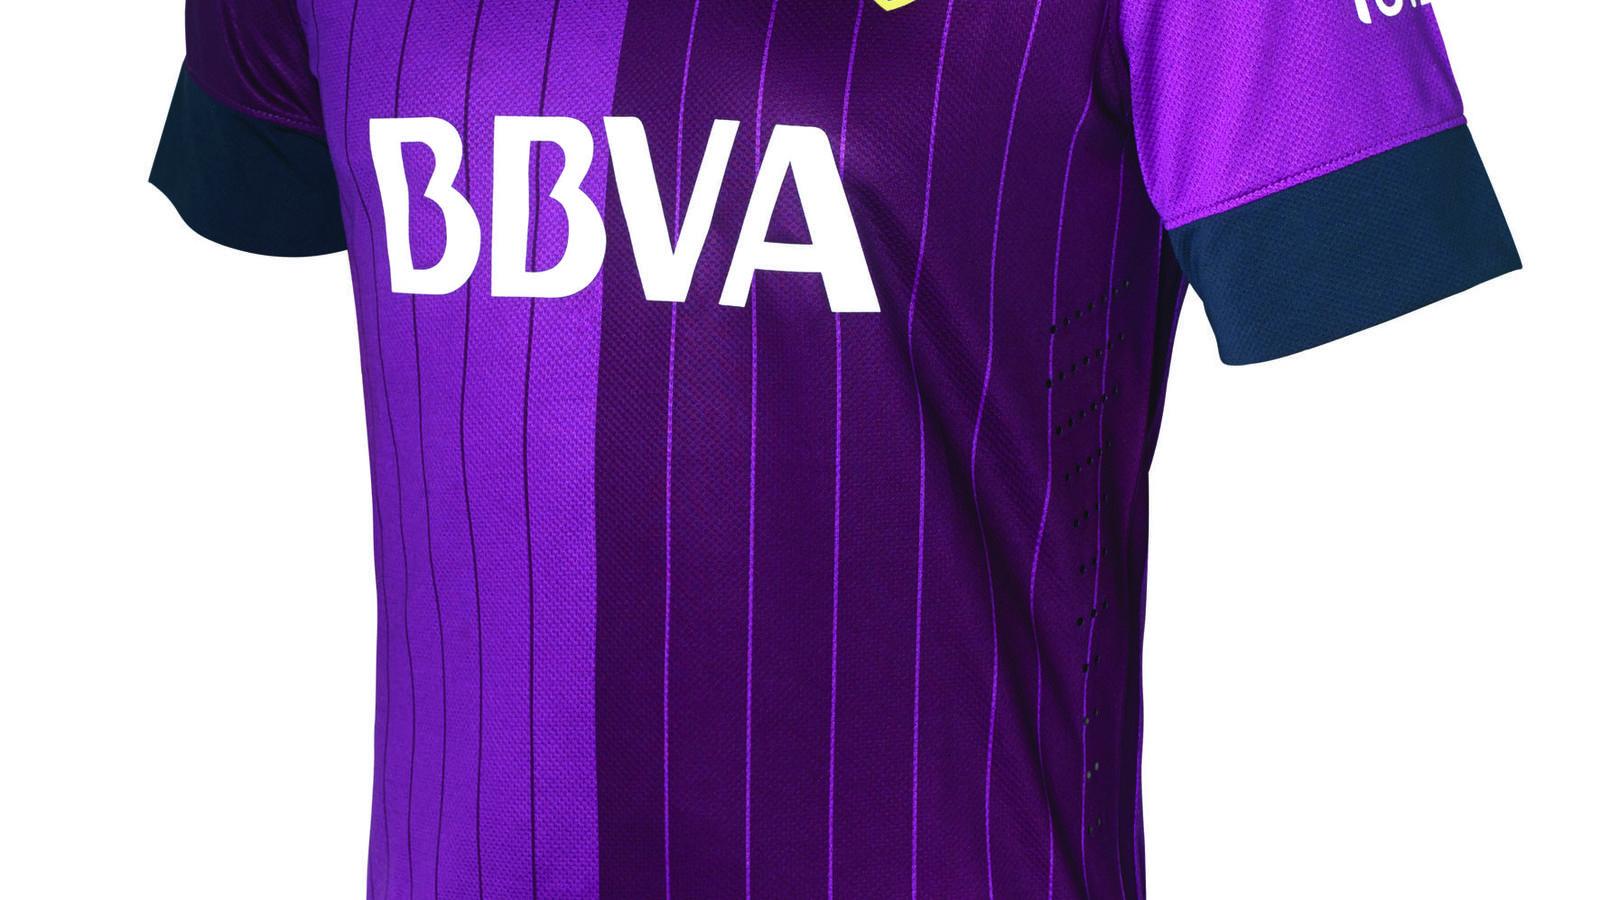 quality design c0f5b 9f064 Nike Football creates limited-edition jersey for Boca ...